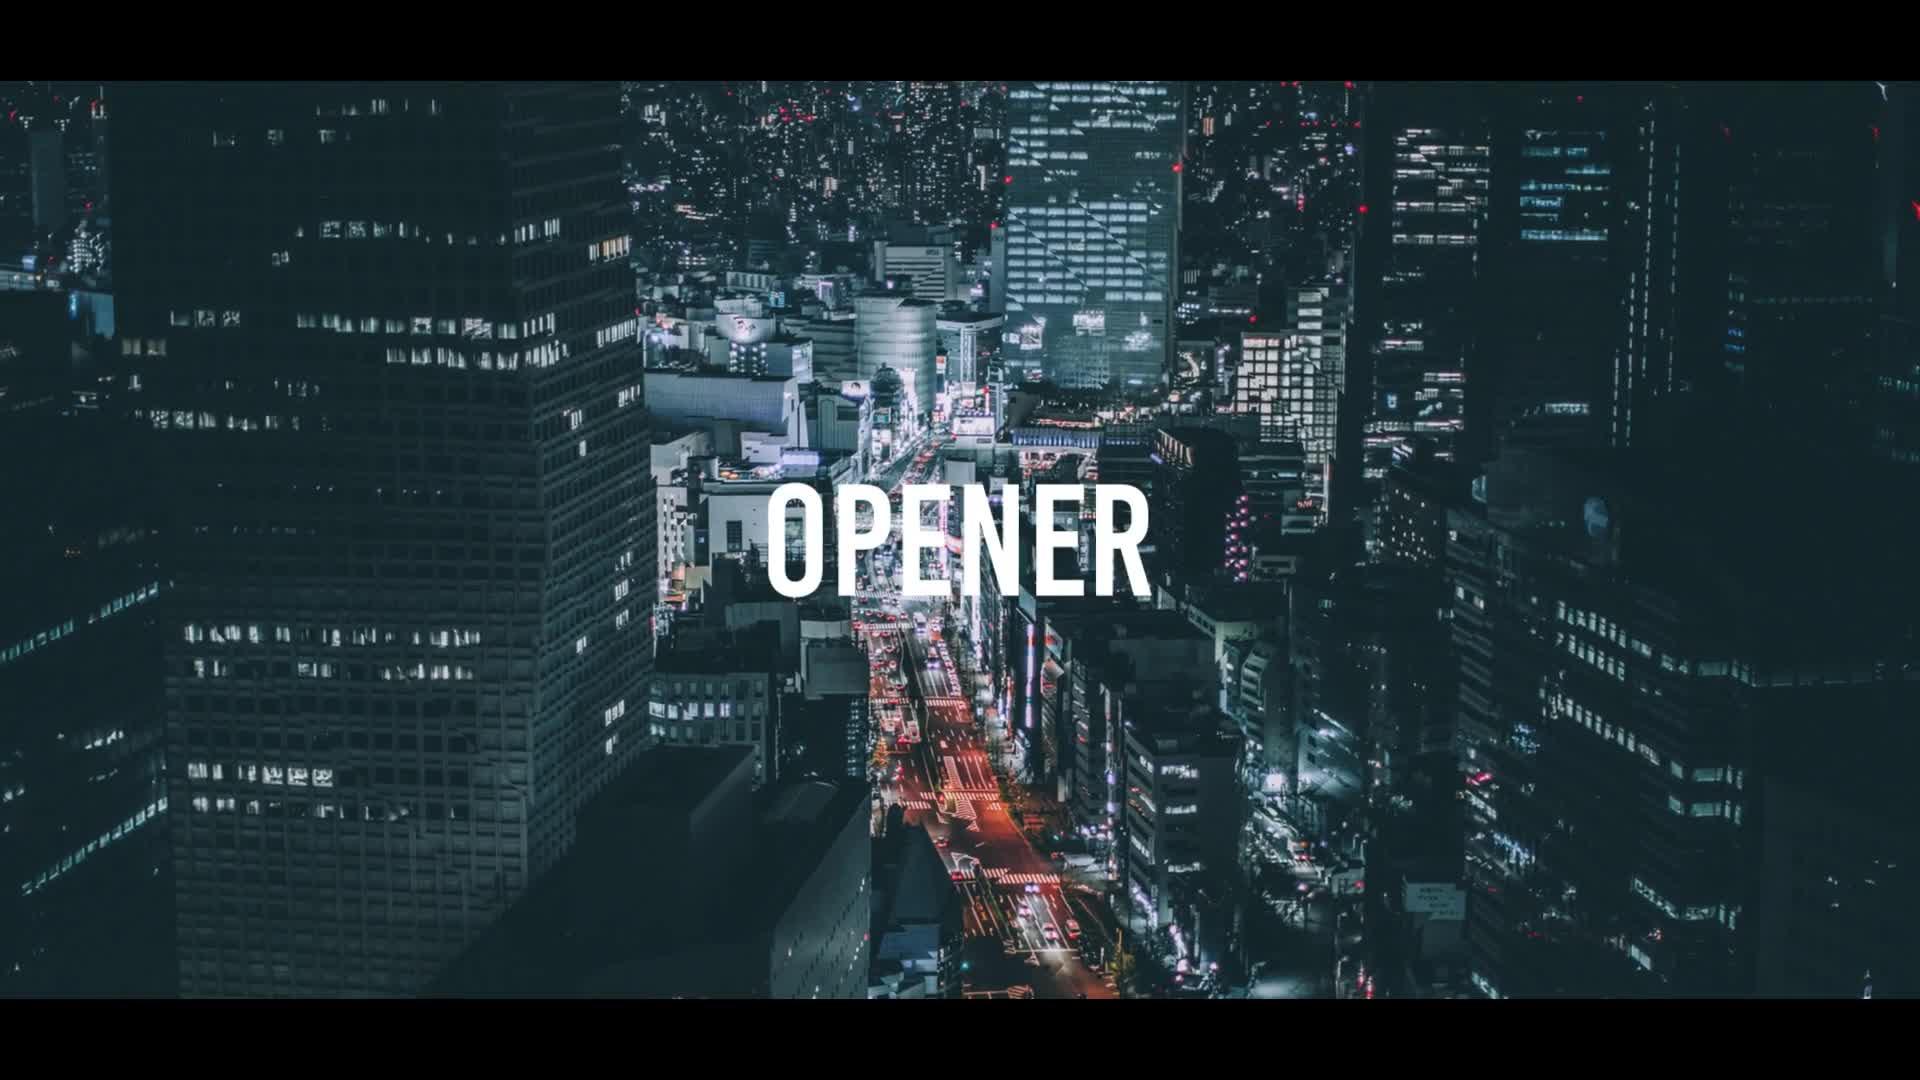 ,Stomp,Clap,免费下载,Opener,片头,潮视频素材